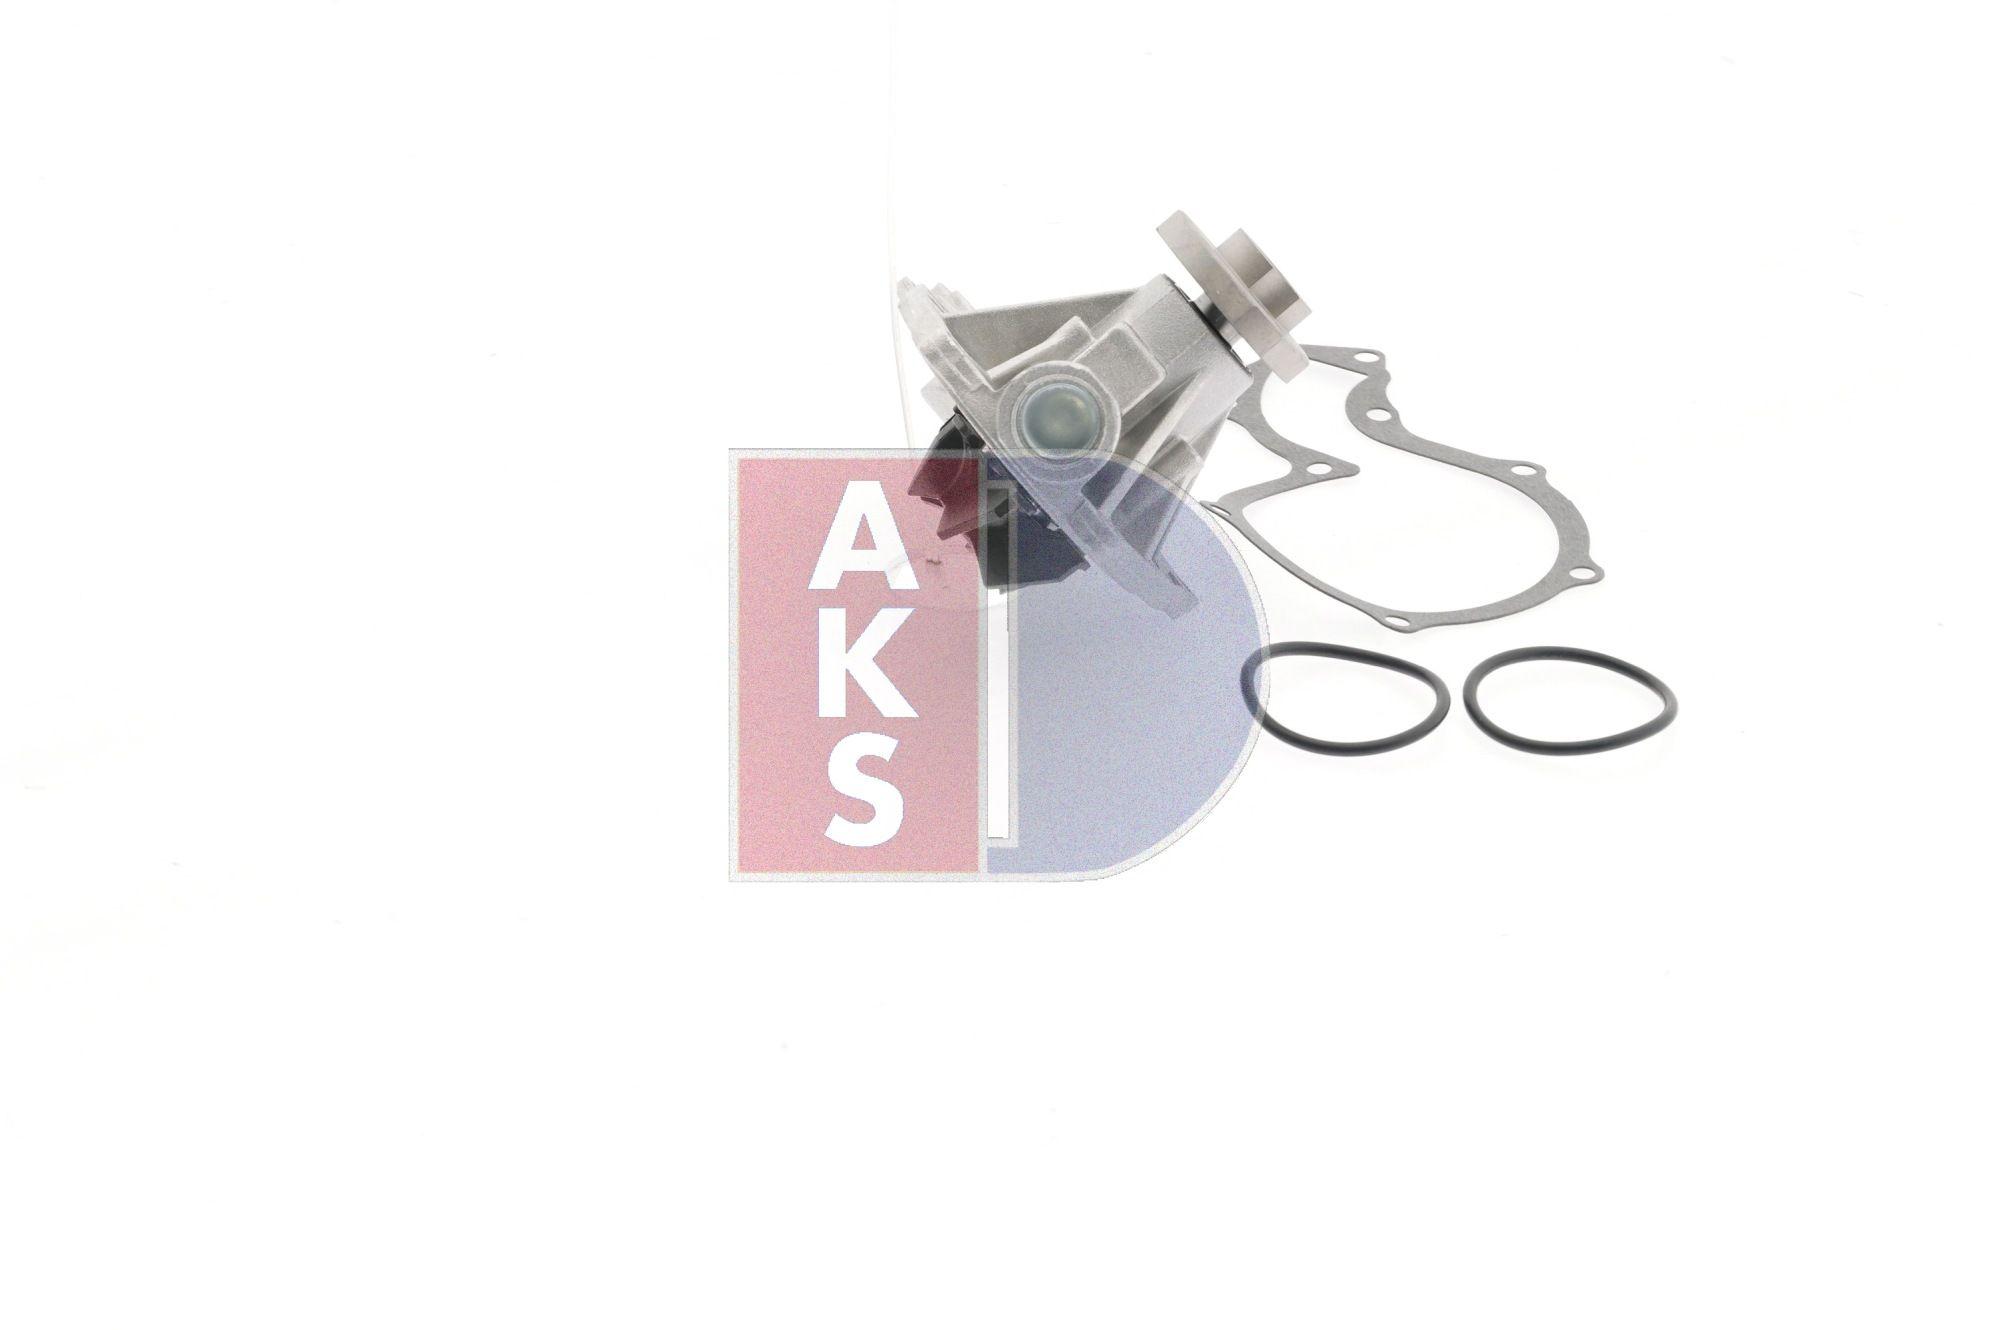 570003N Wasserpumpe AKS DASIS Test